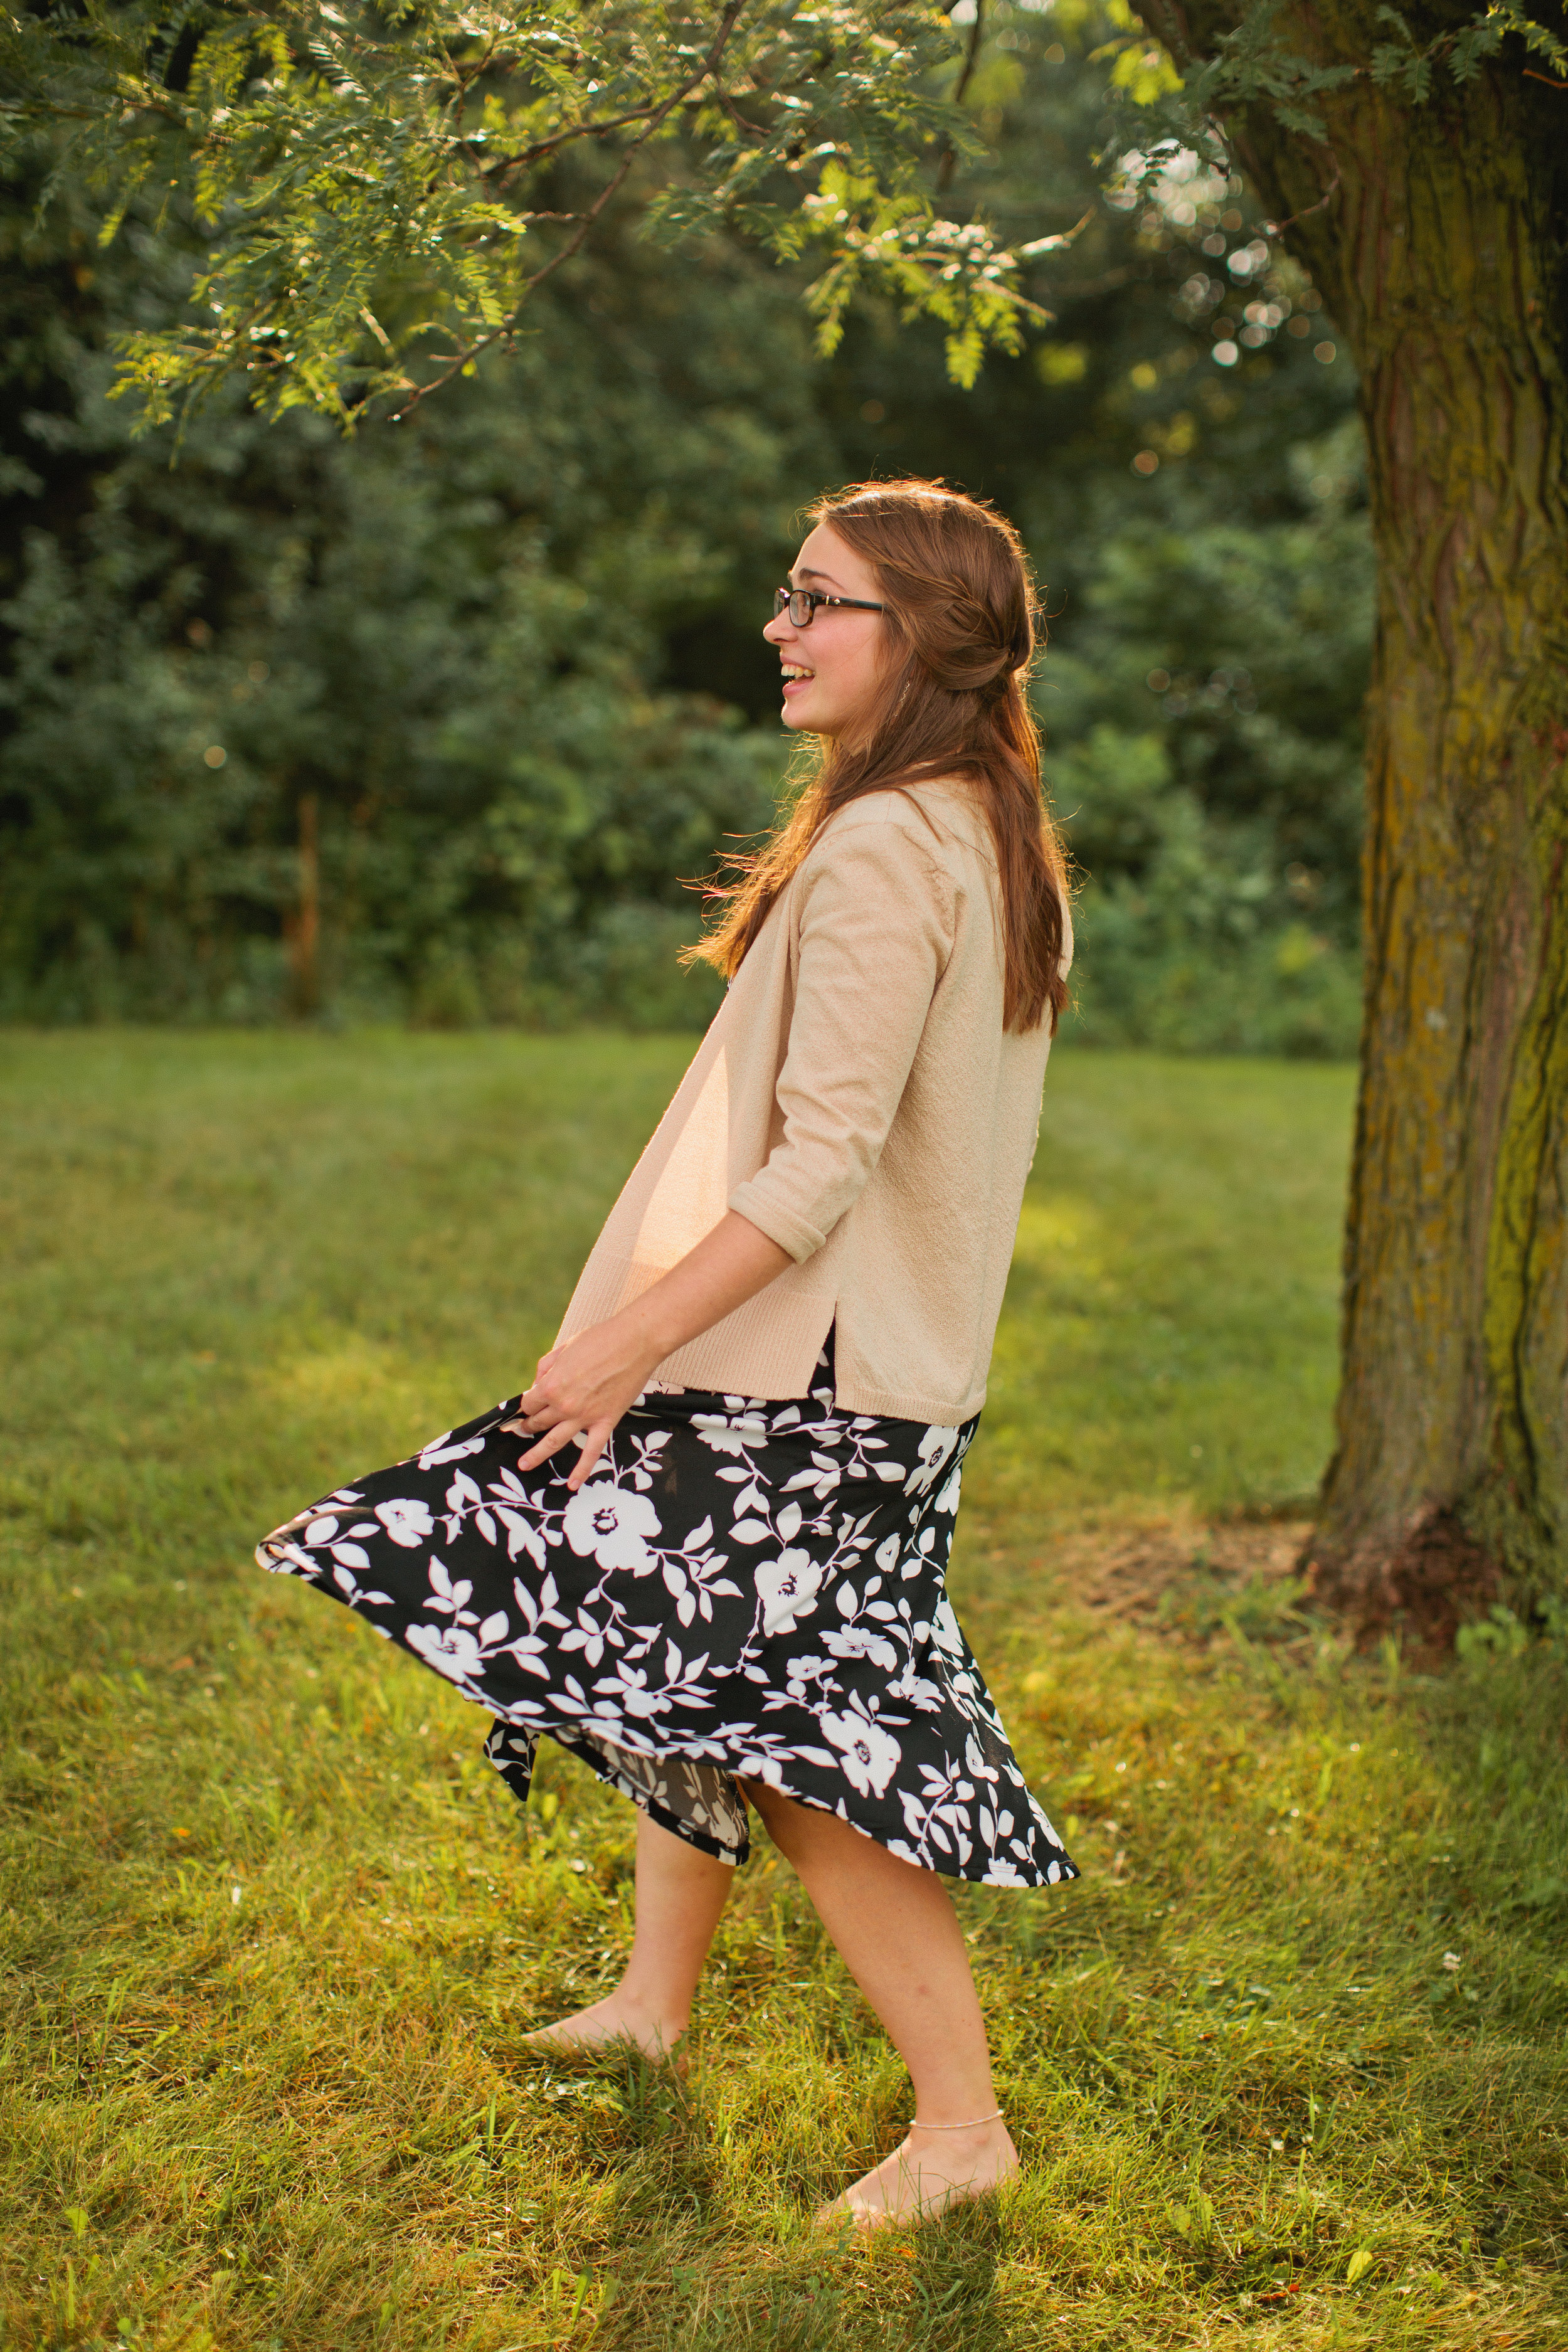 senior girl dancing in dress and cardigan senior photos Iowa